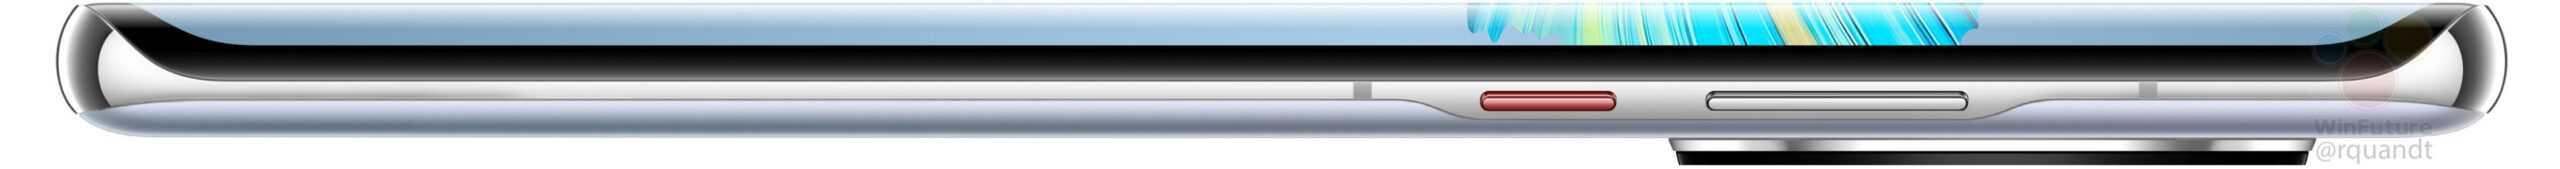 Huawei Mate 40 Pro leak 1